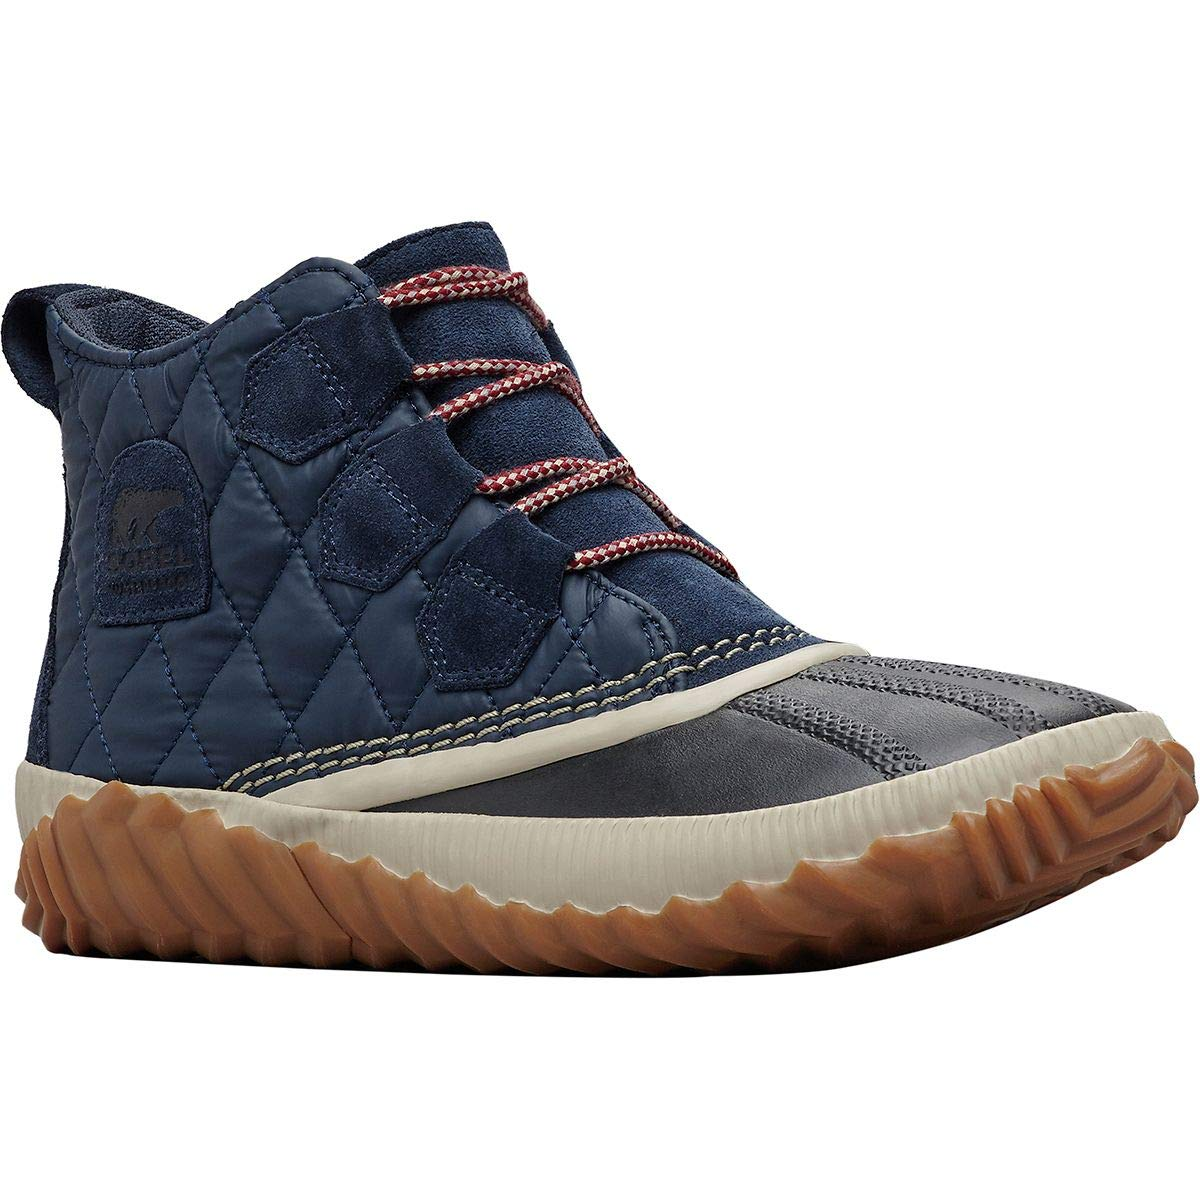 4d8b493d216 SOREL Women s Out  N About¿ Plus Collegiate Navy Suede Combination 5 B US   Amazon.co.uk  Shoes   Bags